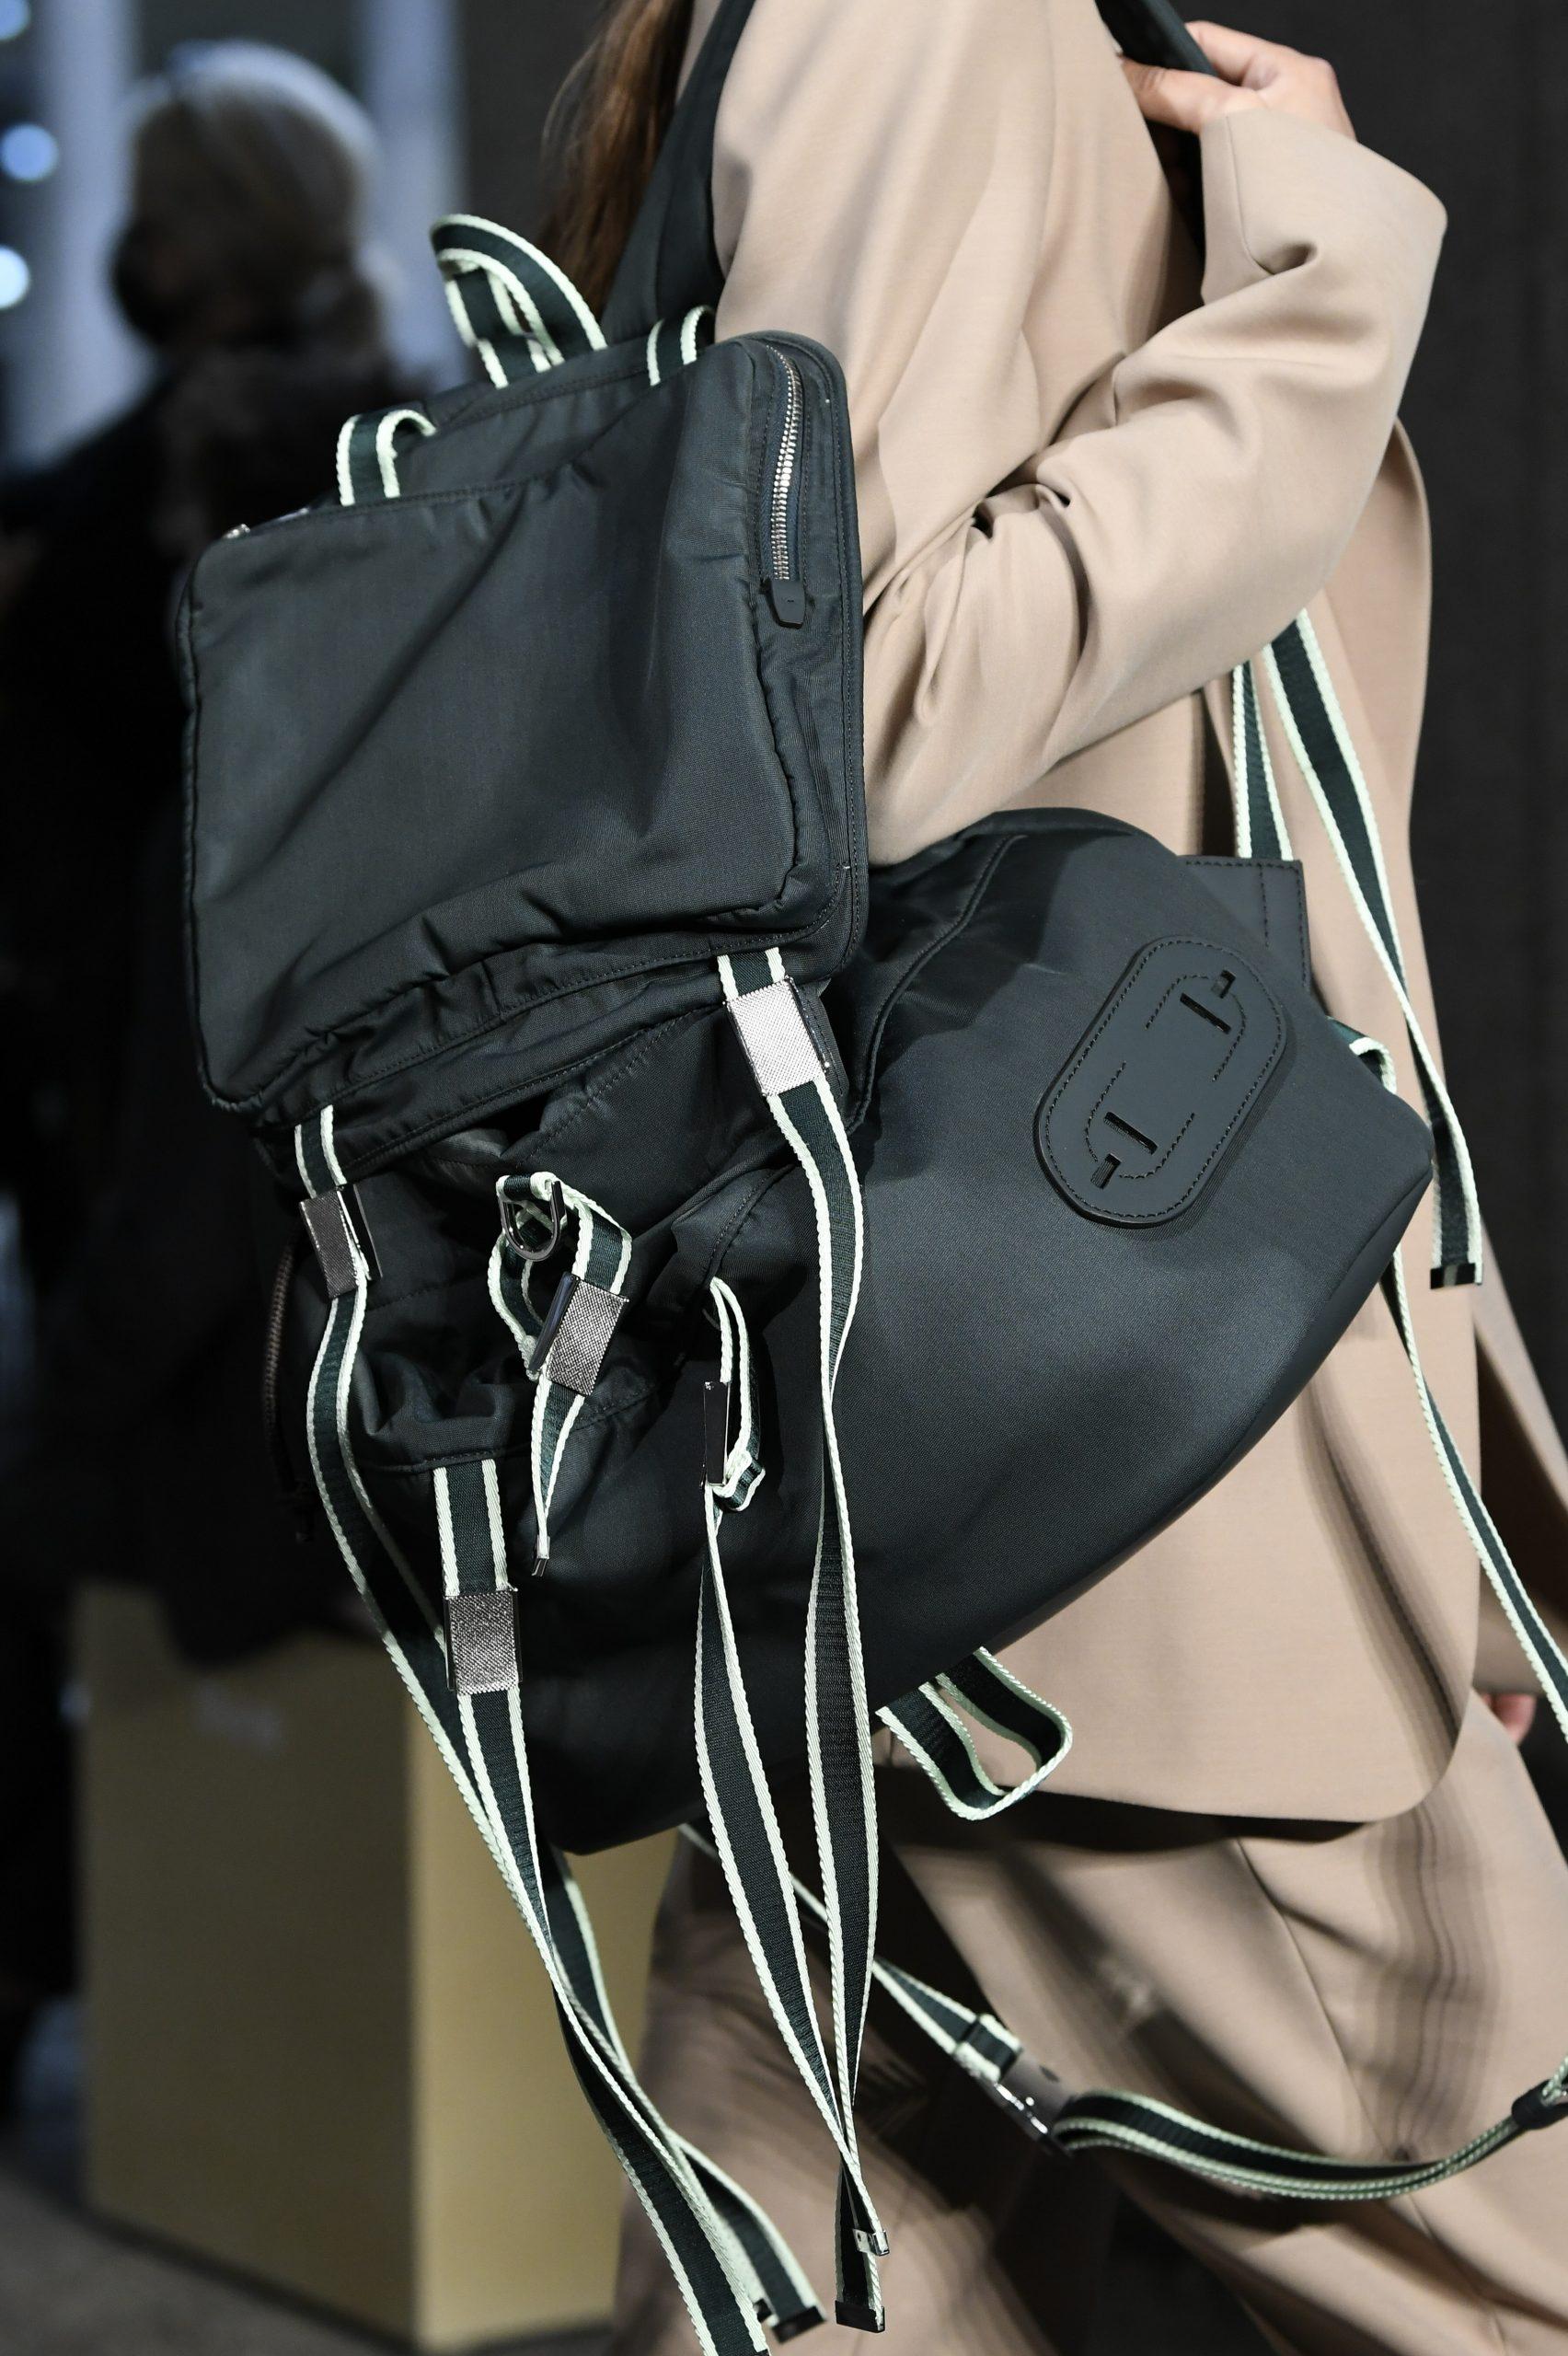 Backpack is back: Αυτή είναι η τσάντα που θα κρατήσουμε όλες